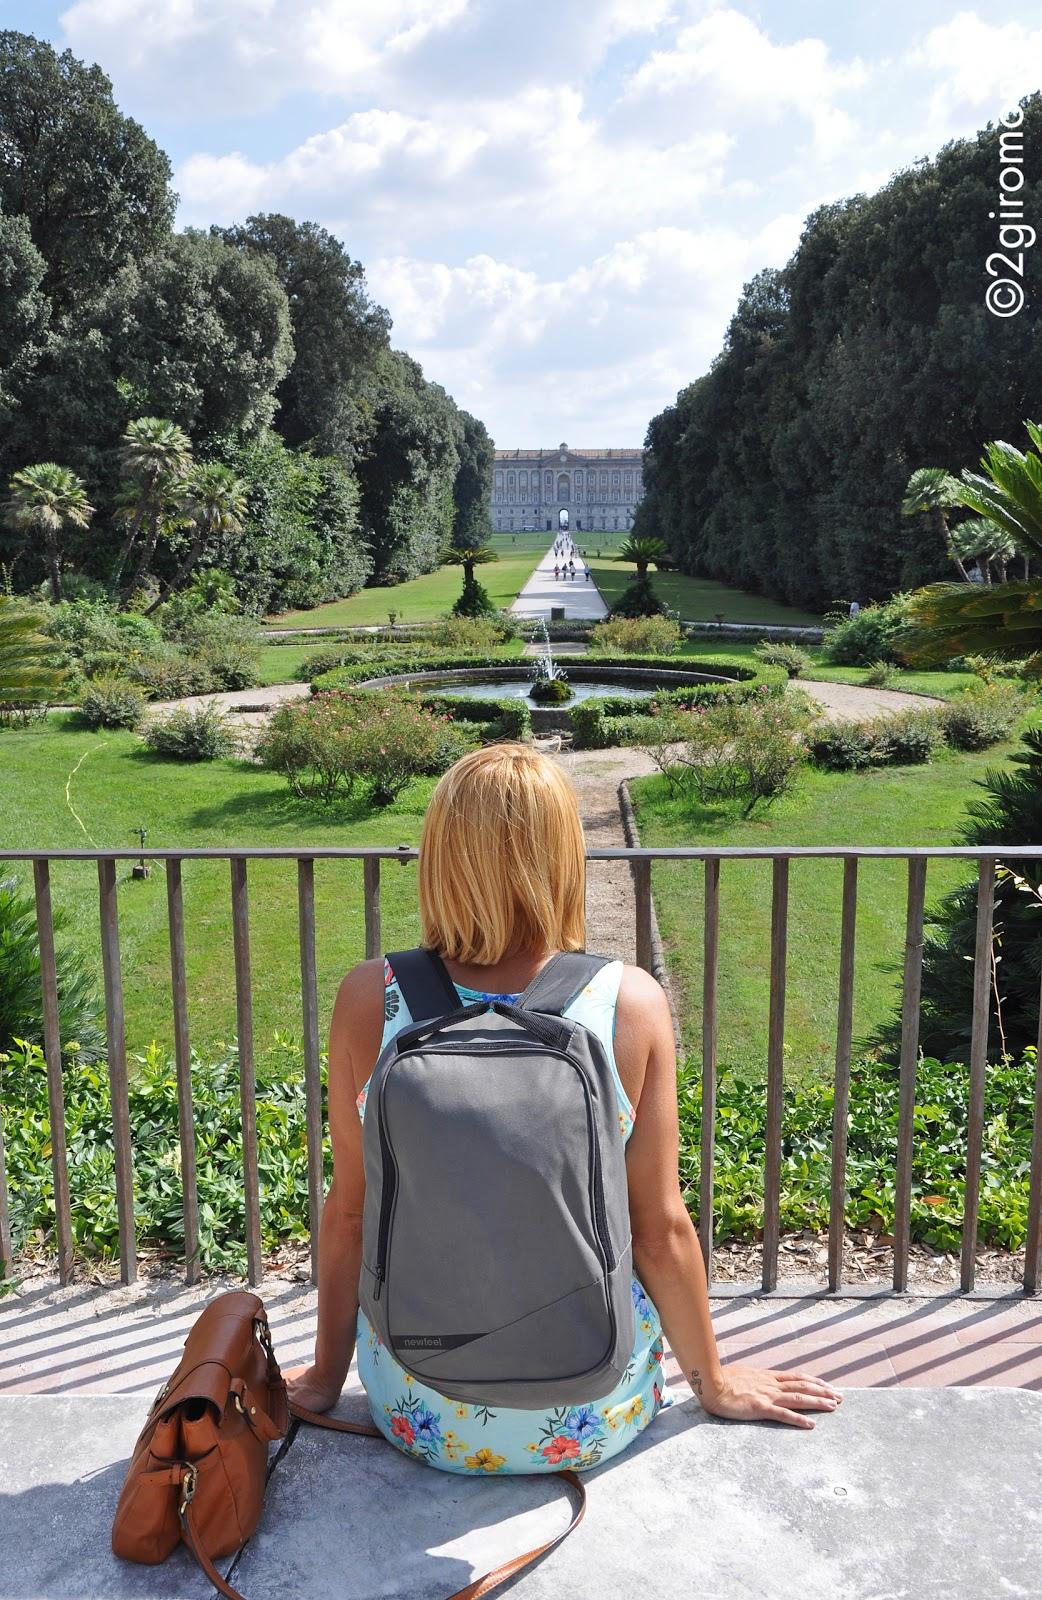 Parco, Reggia di Caserta